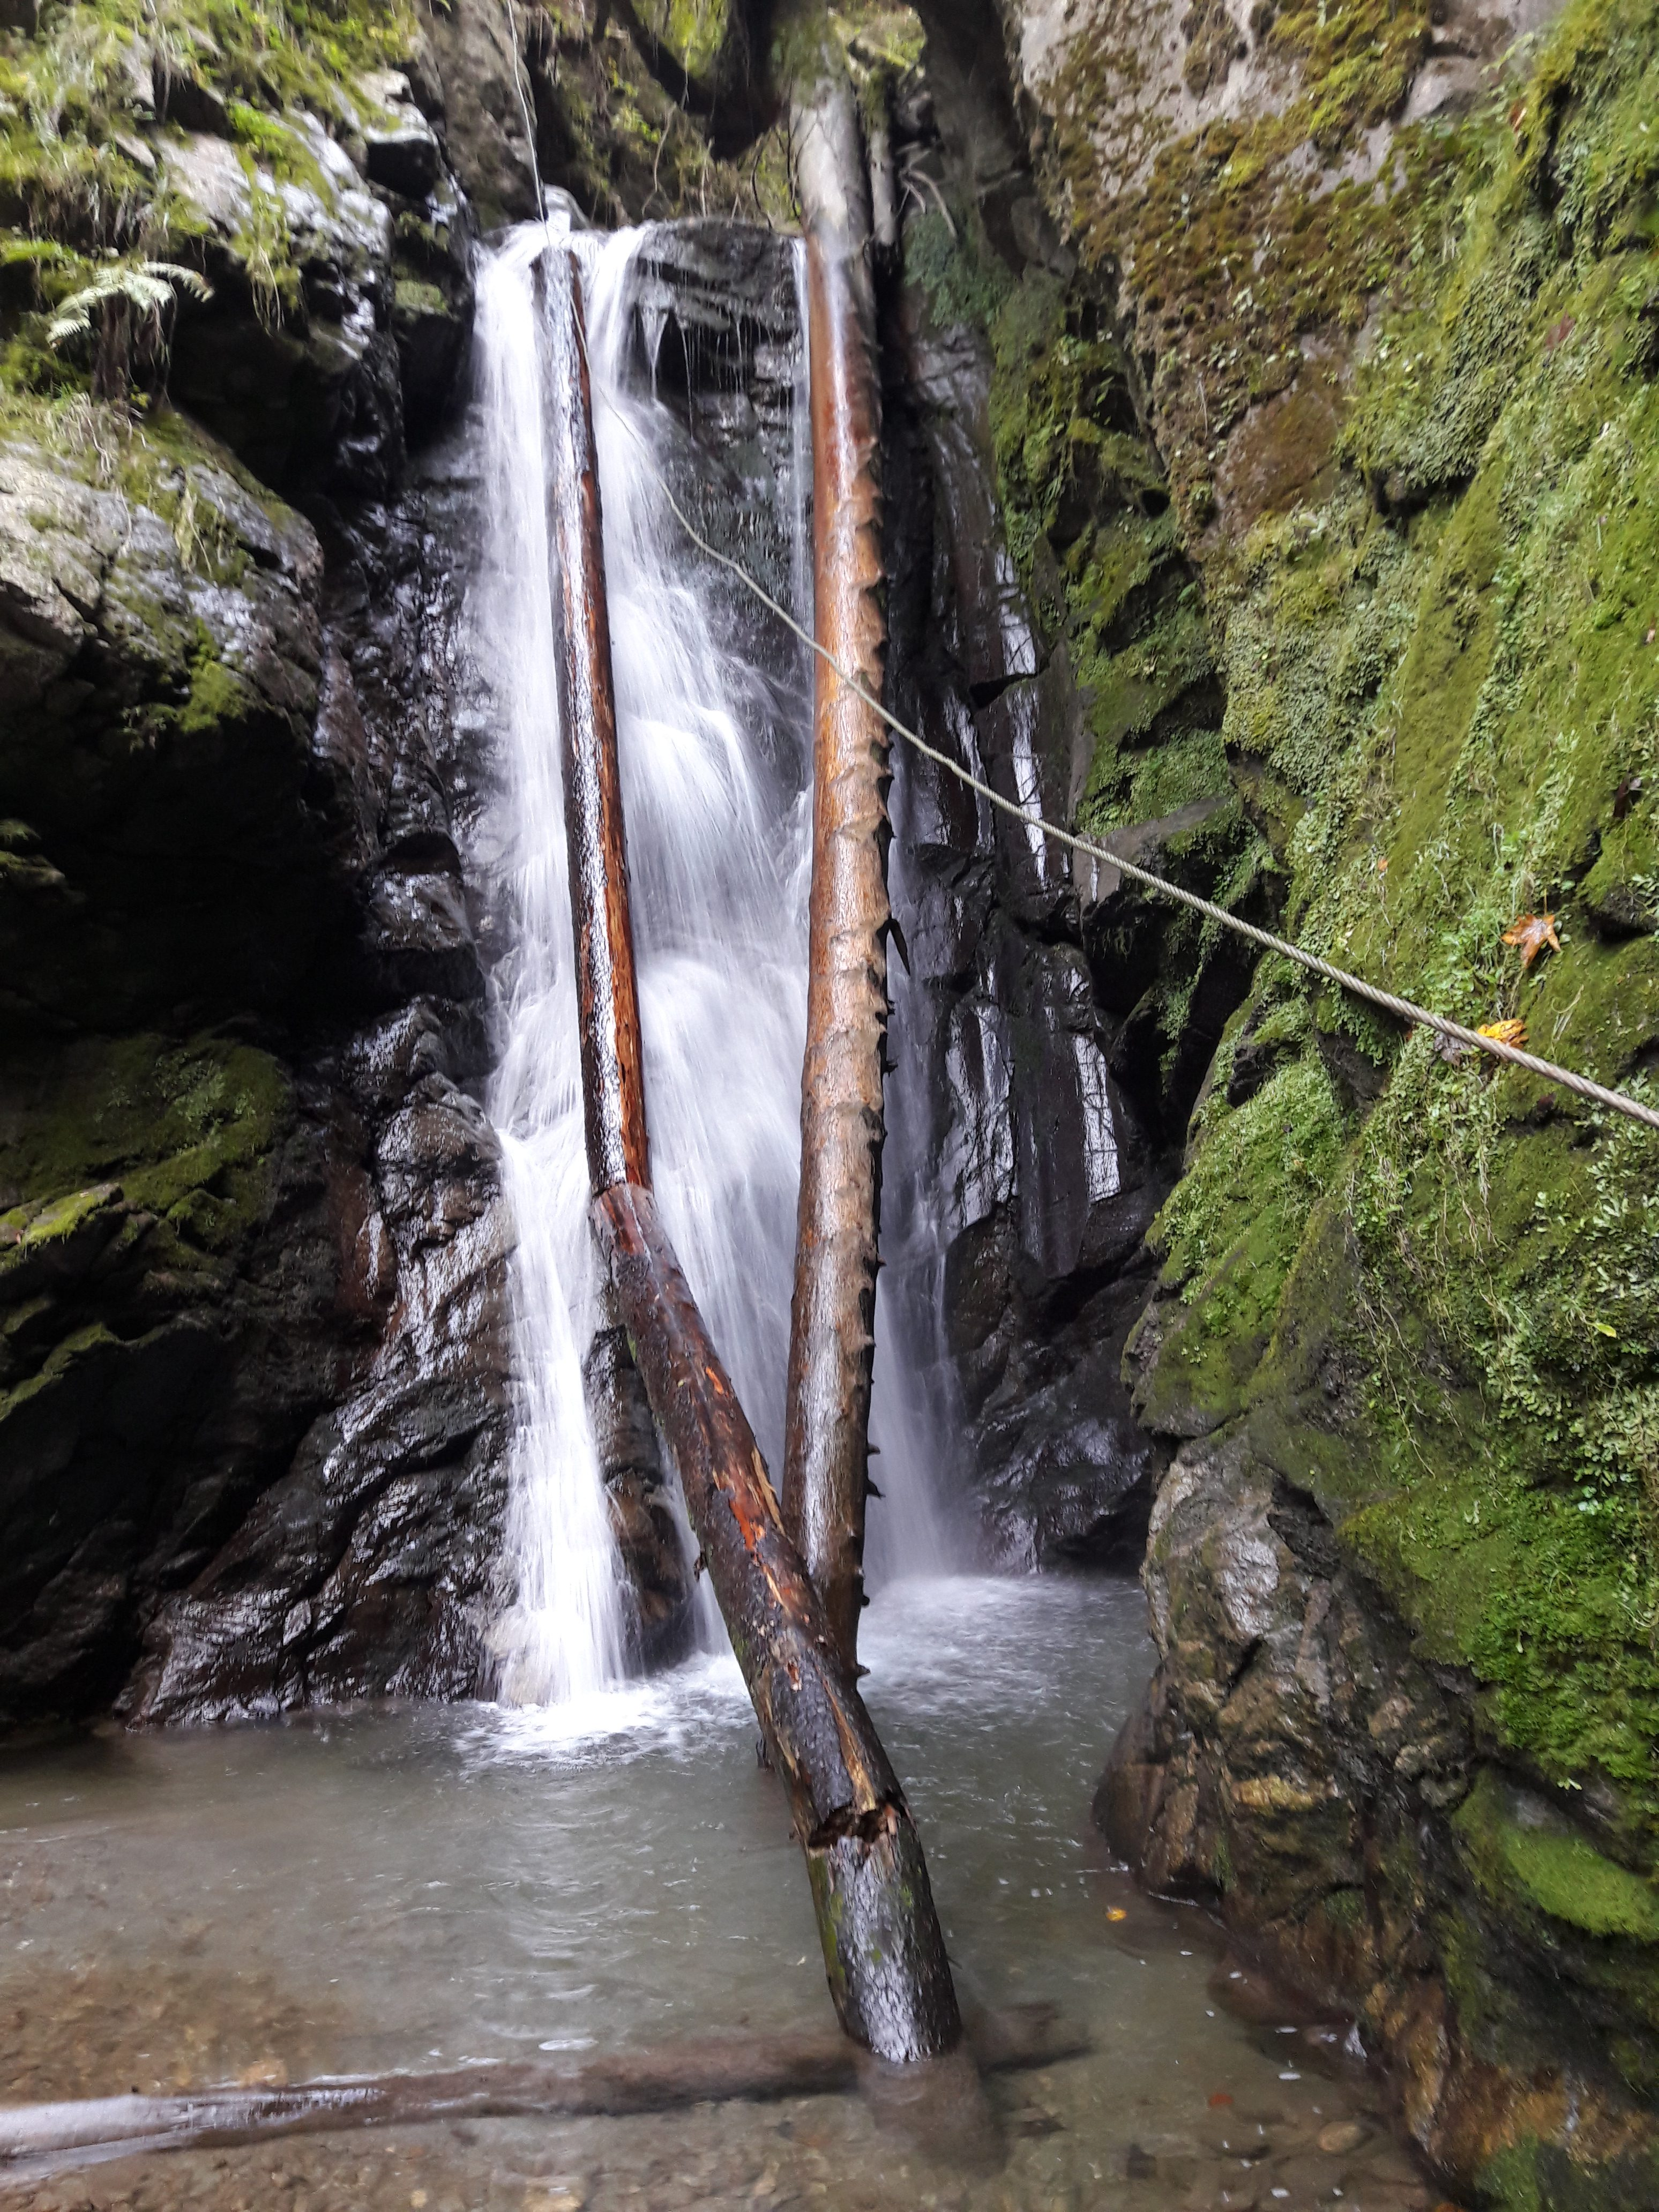 Weerbergcanyon Wasserfall A20 m